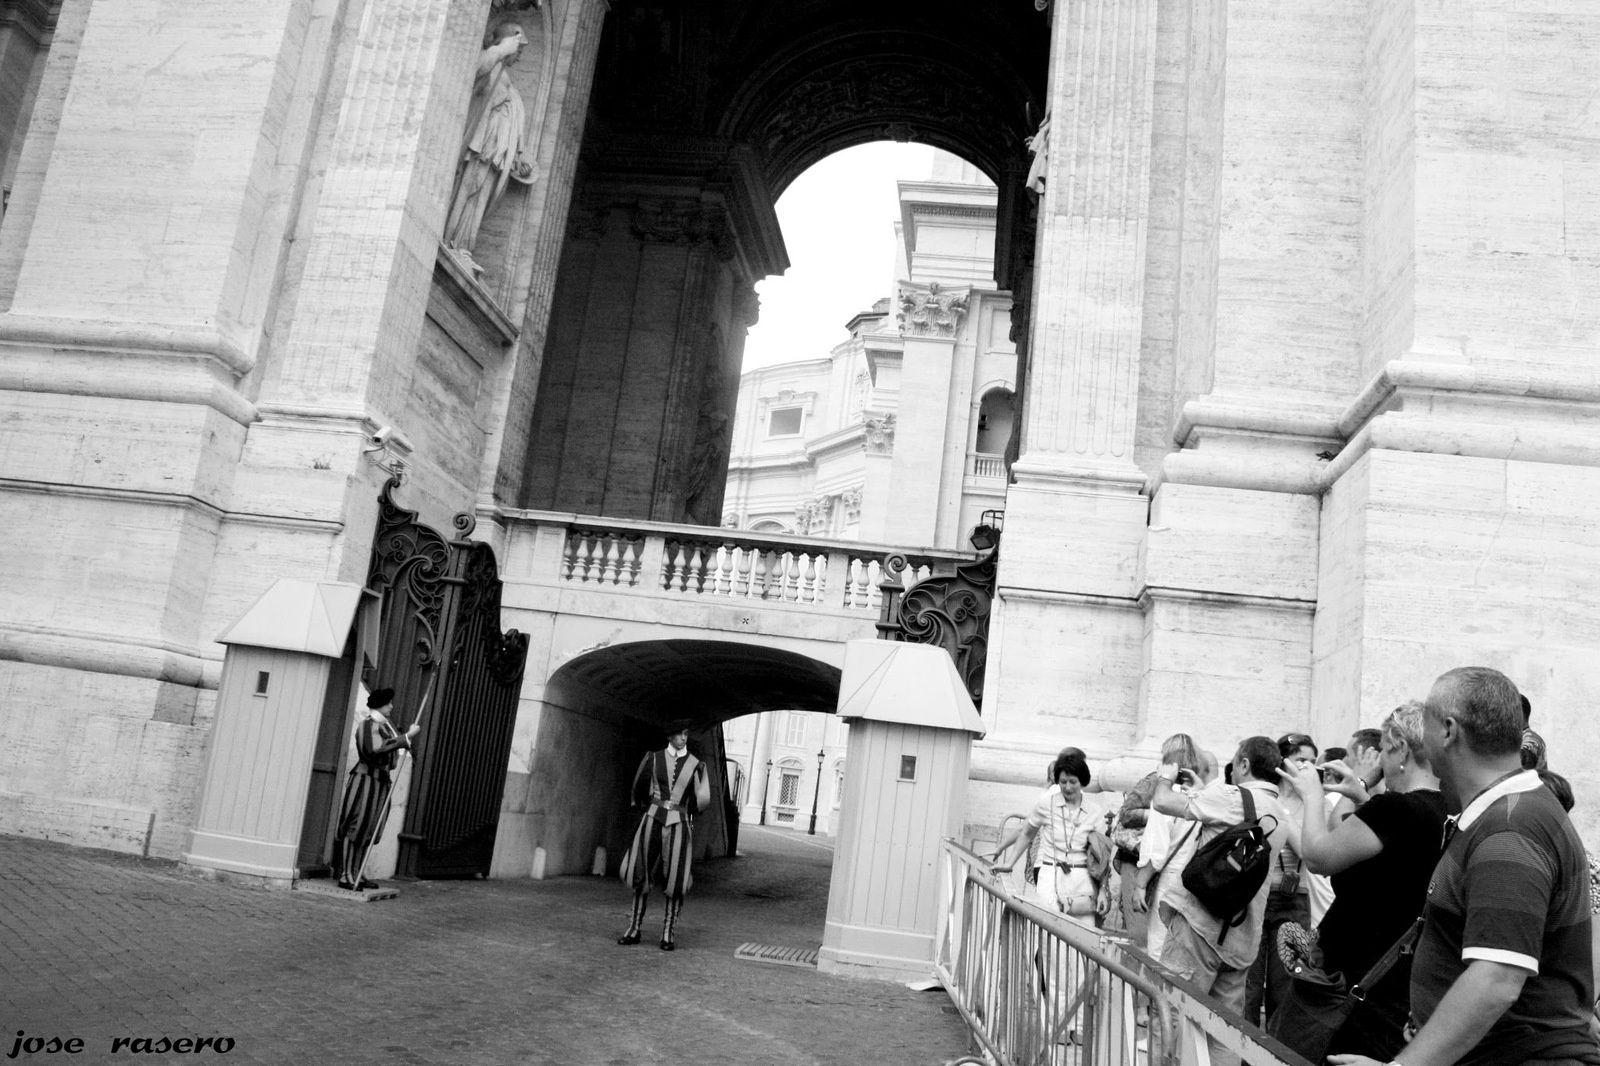 'Vaticano'